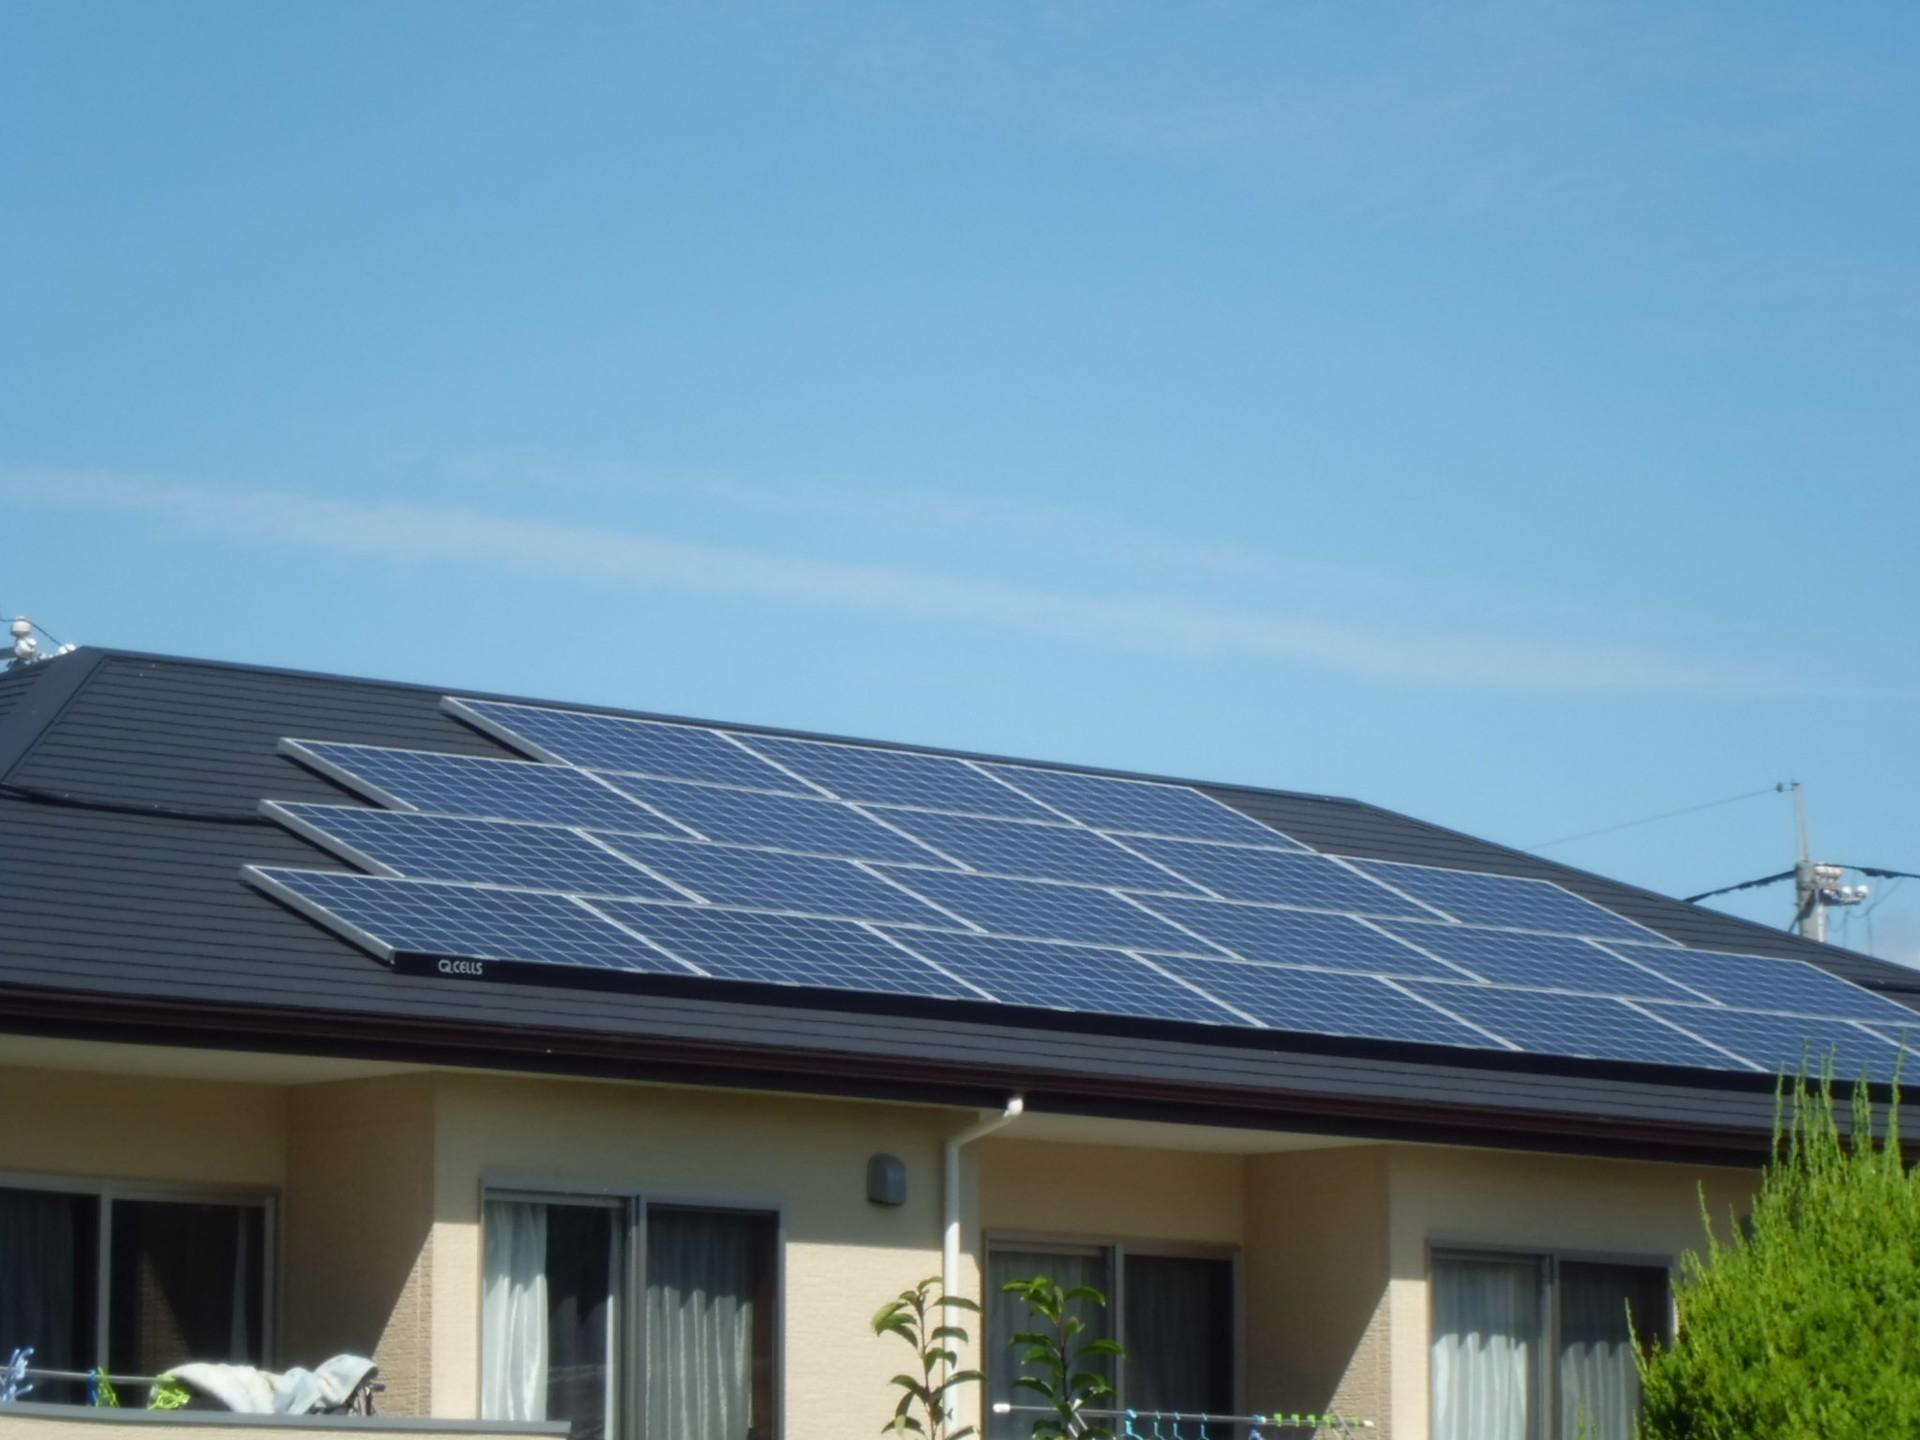 太陽光発電導入後も節電